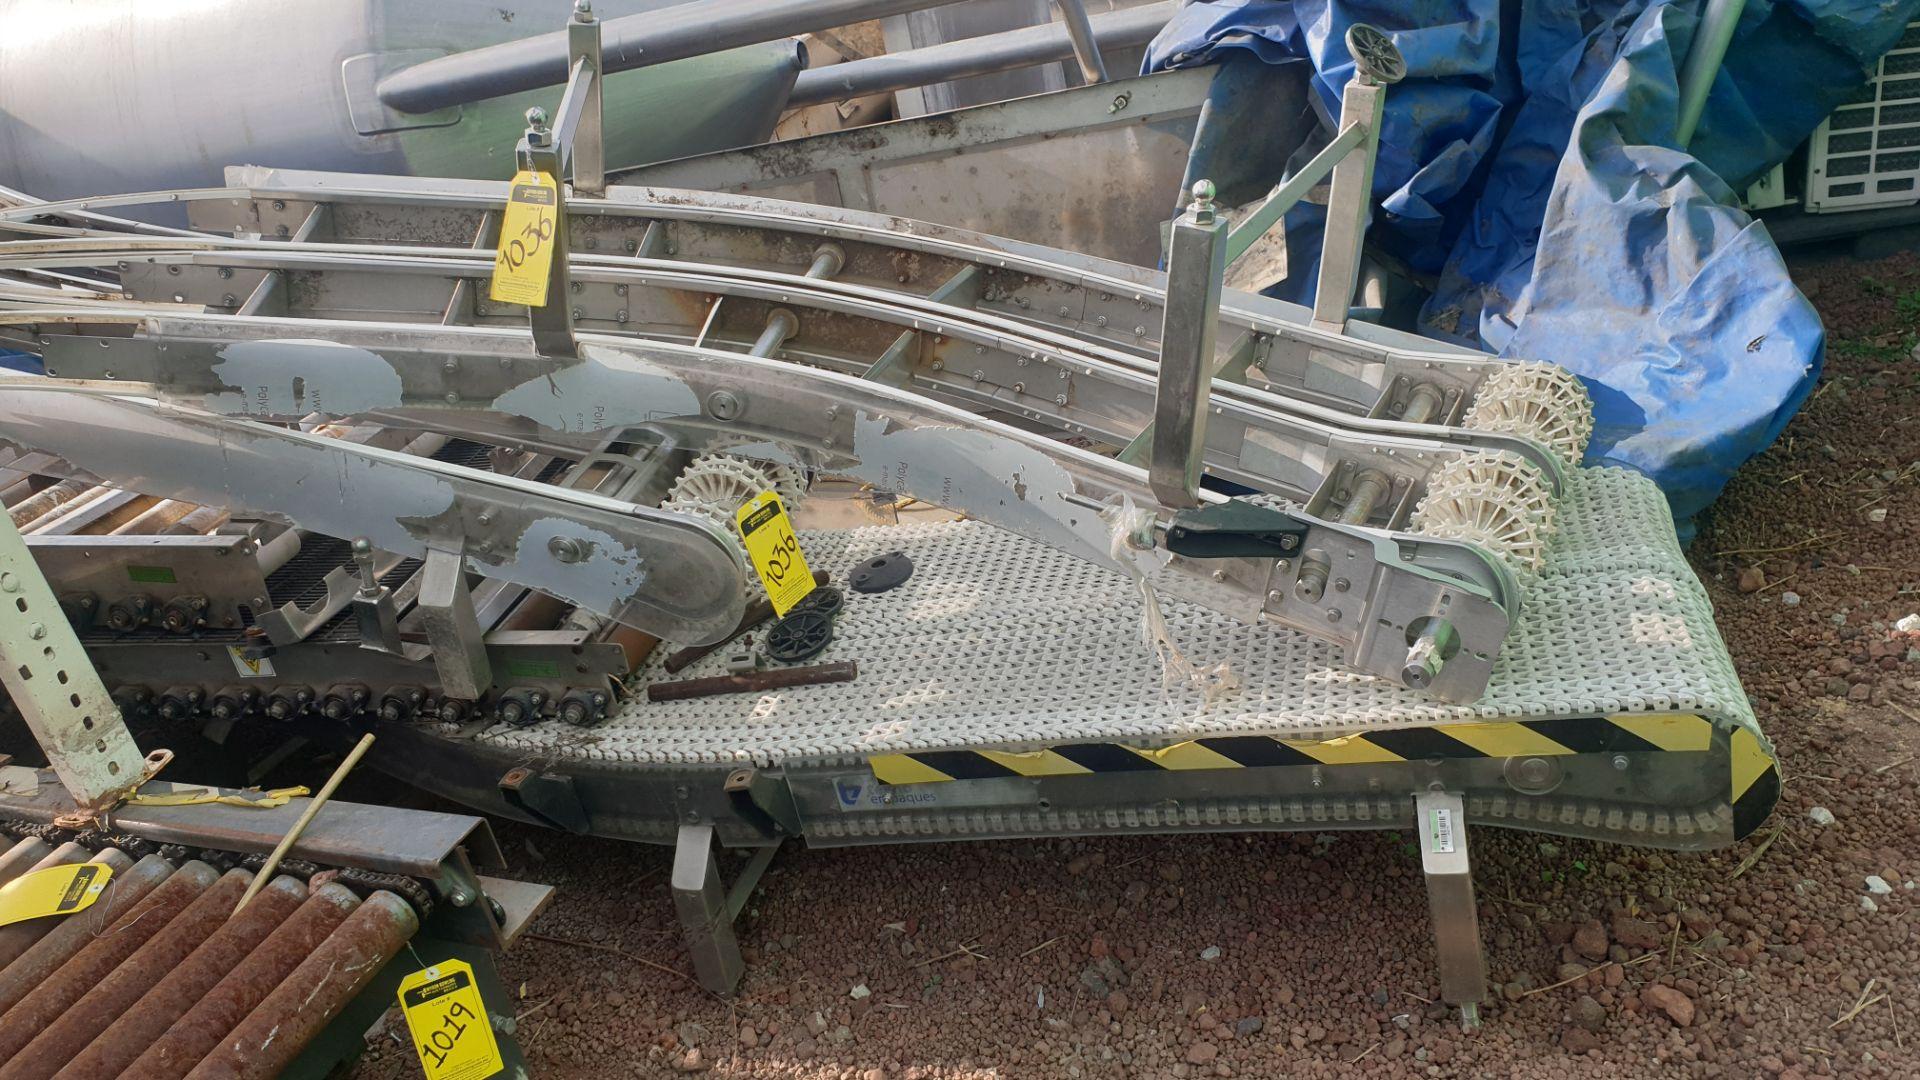 S conveyor belt batch. Please inspect - Image 3 of 9